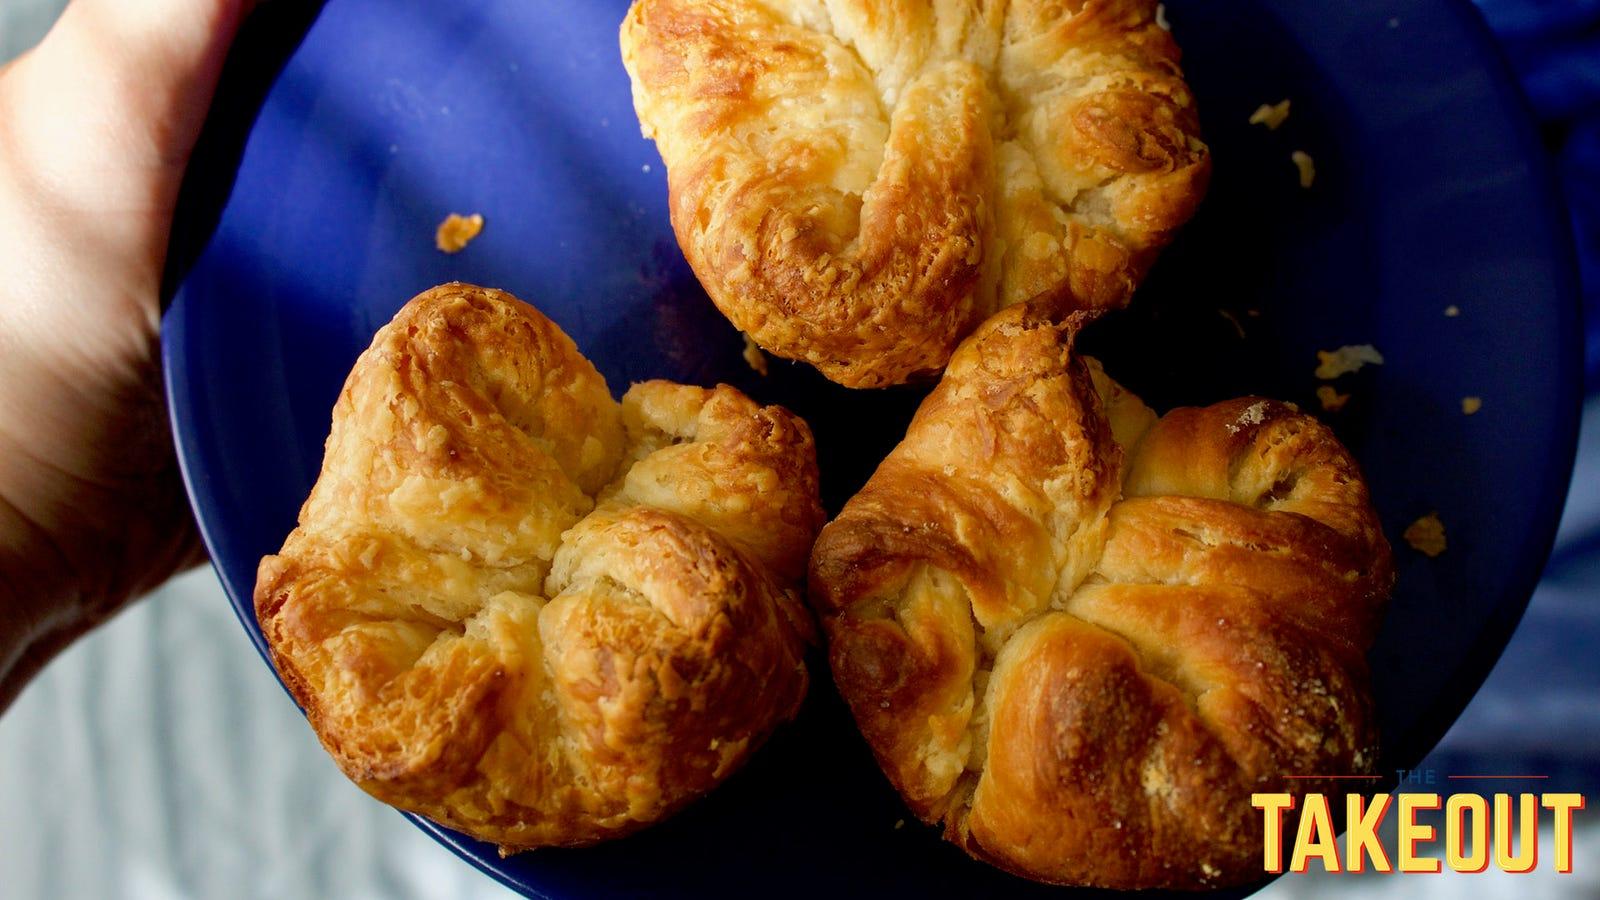 Kouign amann was my home baking Shangri-La